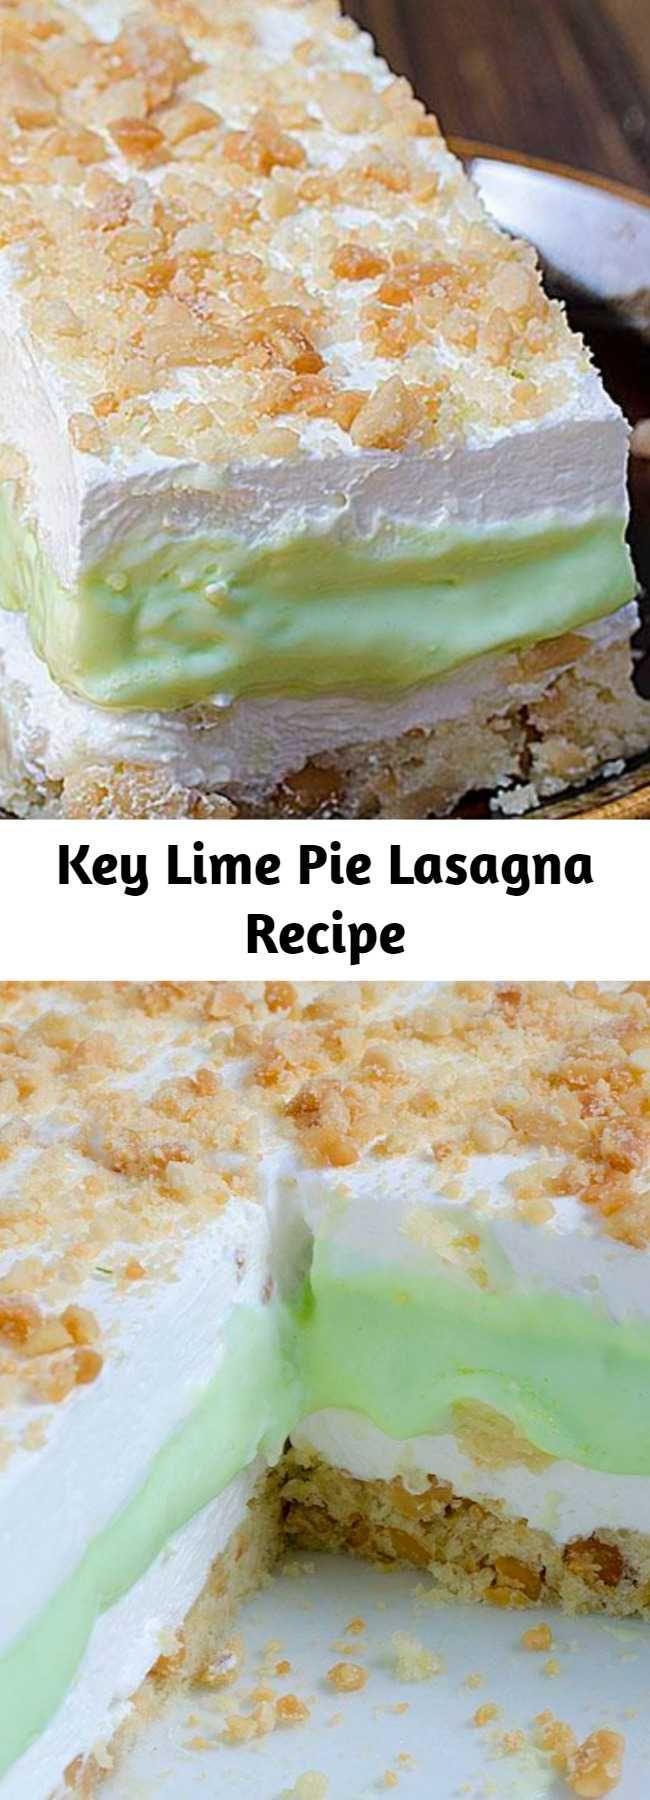 Key Lime Pie Lasagna Recipe